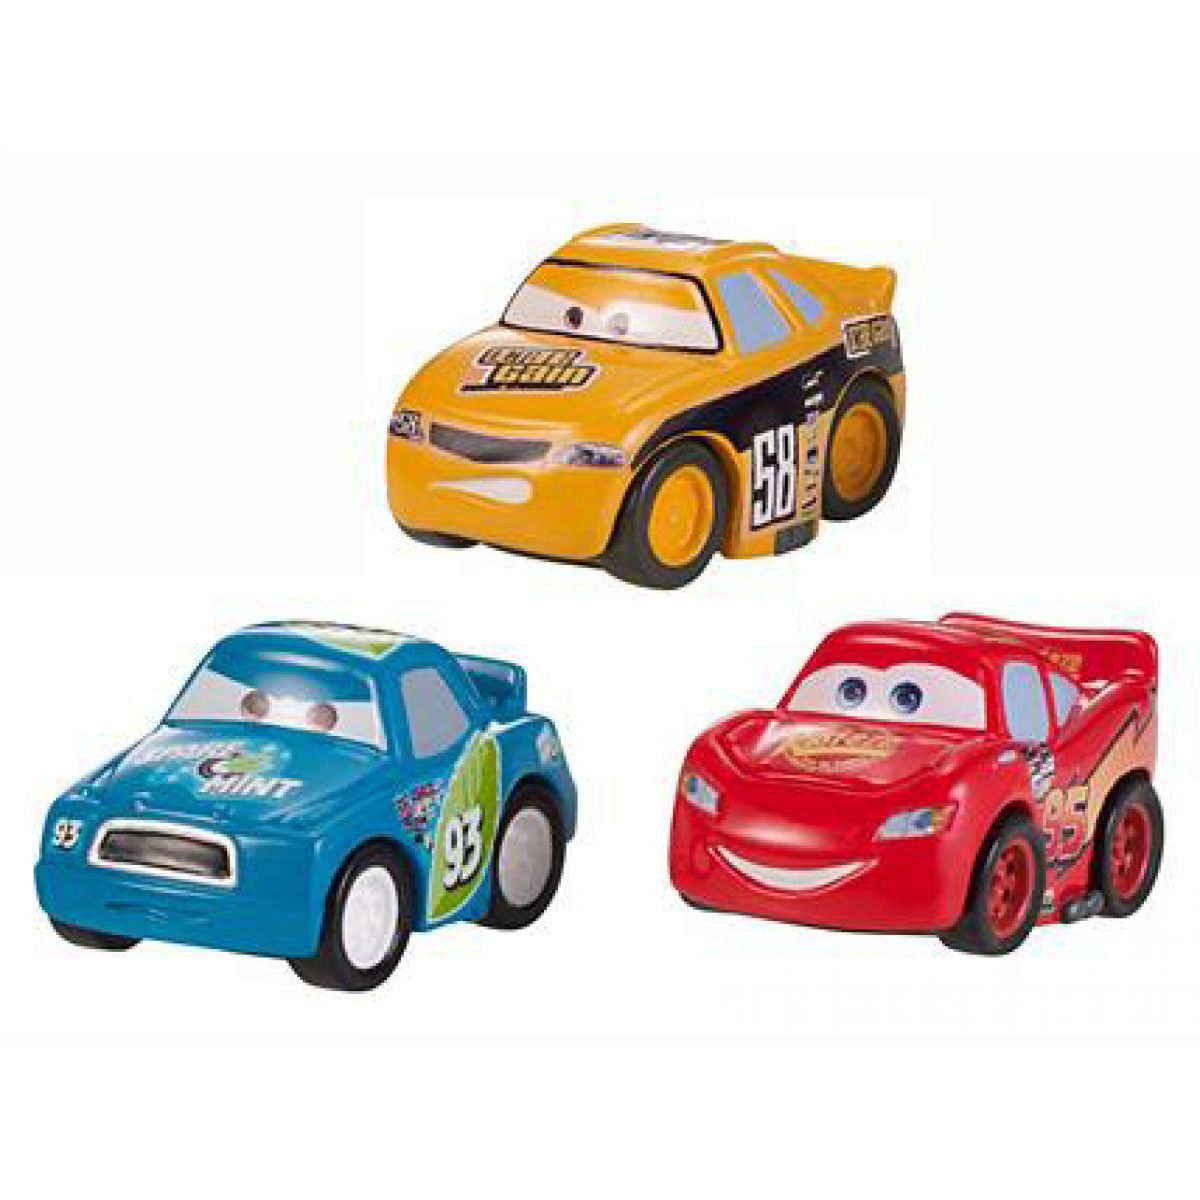 Mattel Cars Micro Drifters 3ks - W7162 Octane Gain, McQueen, Spare o Mint